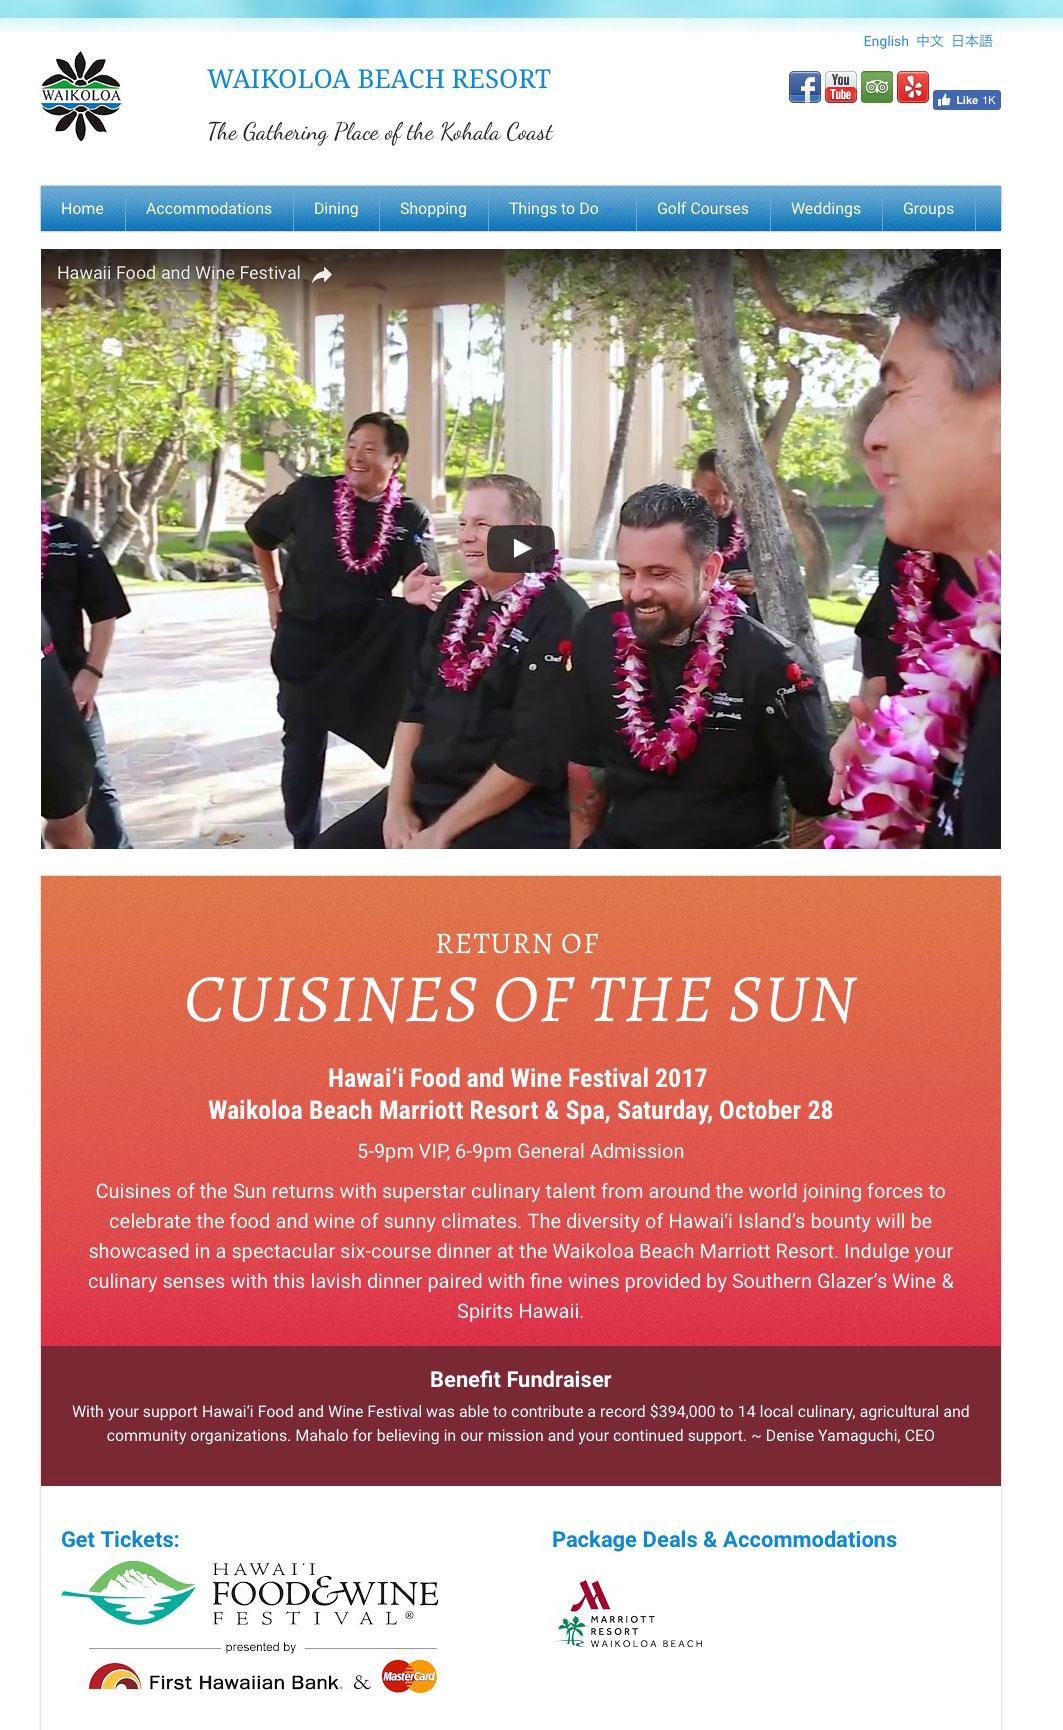 Hawai'i Food & Wine Festival – Return Of The Cuisines Of The Sun